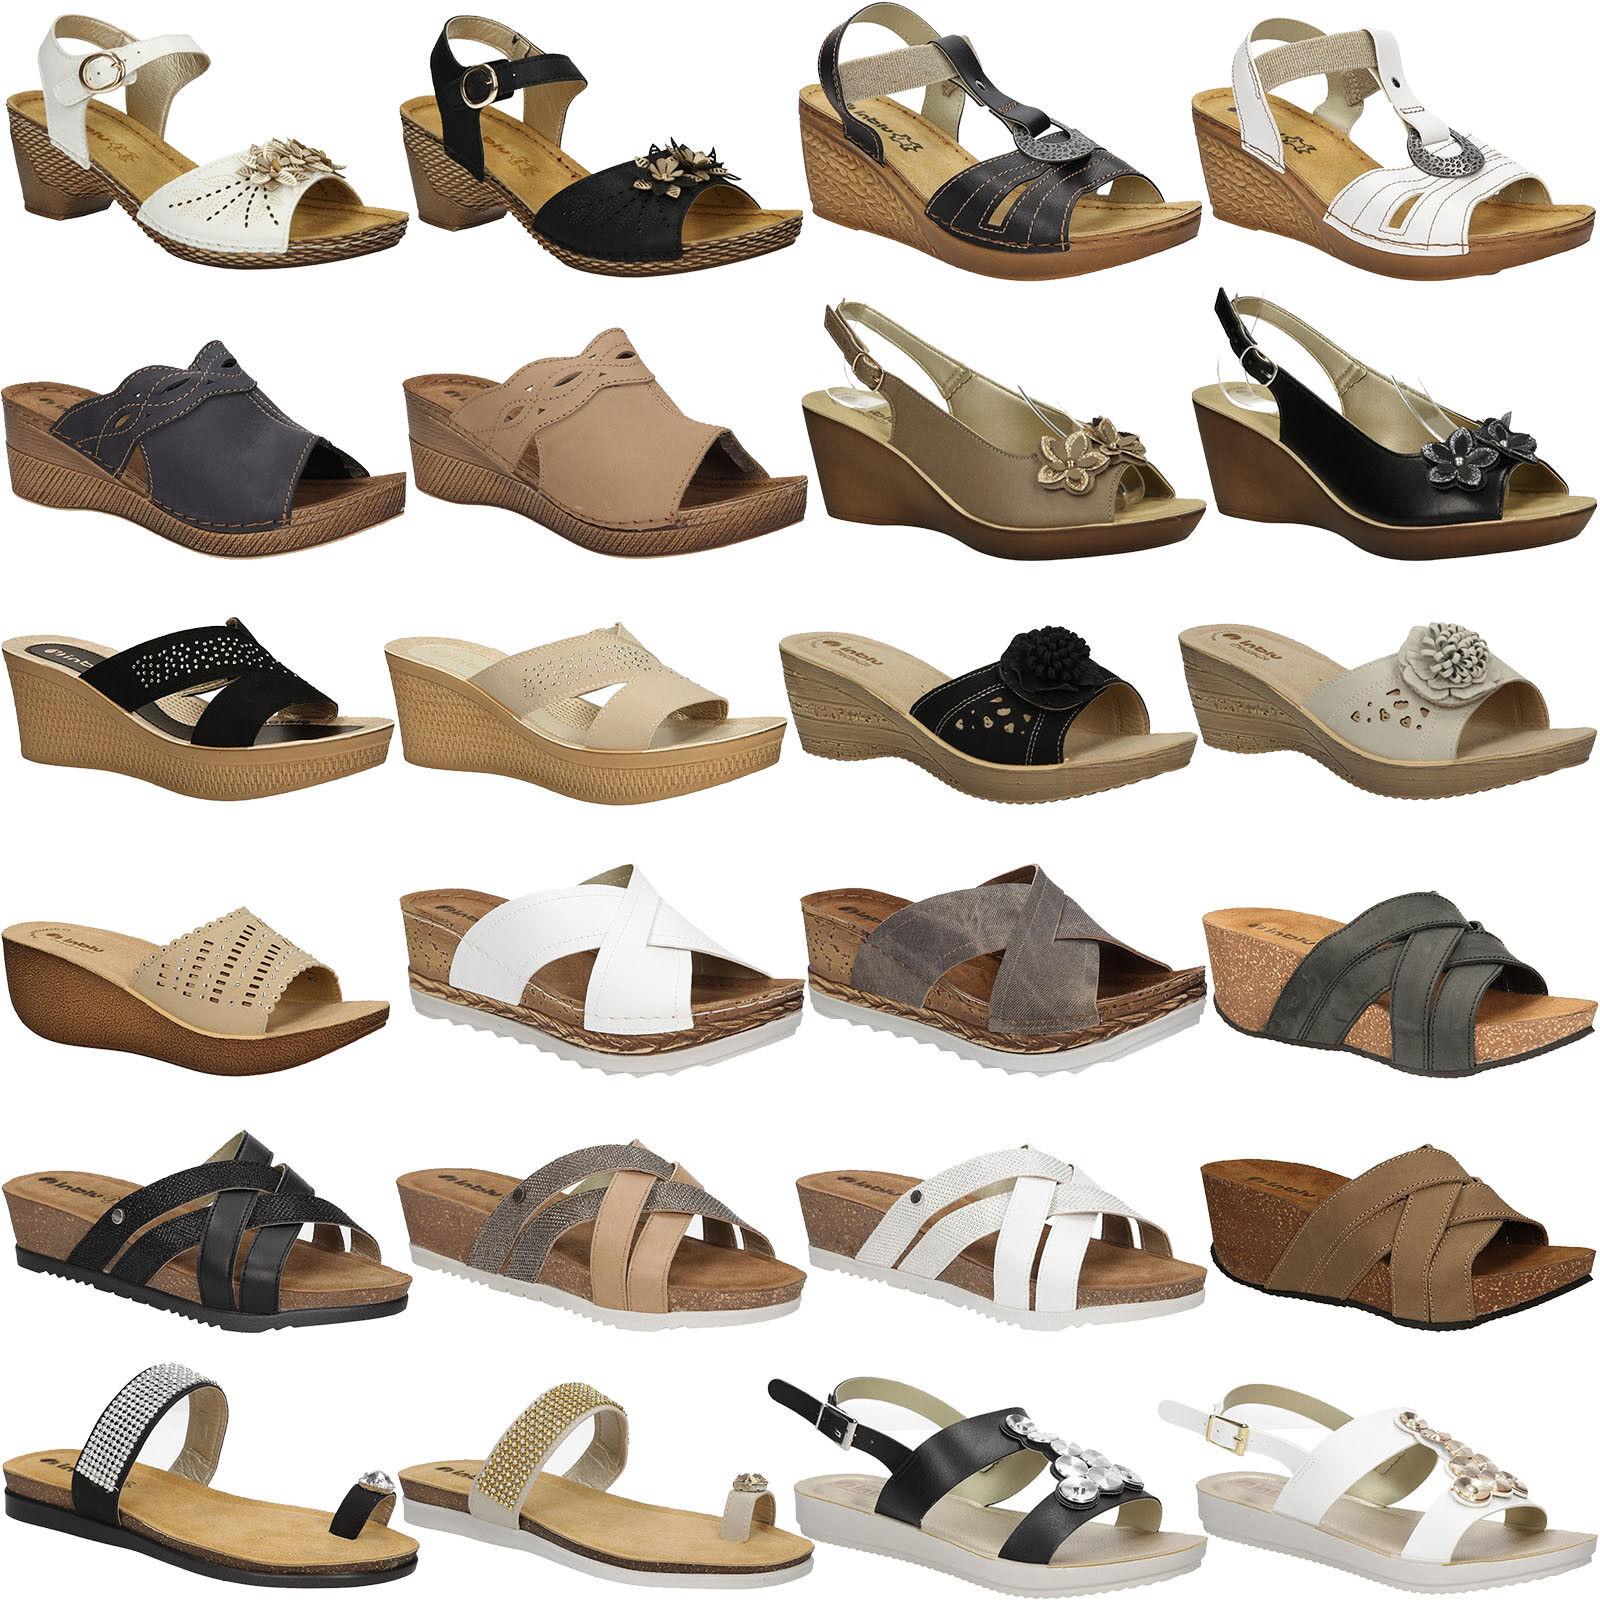 Damen Sandaletten Inblu Pantoletten Sommer Modisch Komfortable Gr. 36-41 SALE